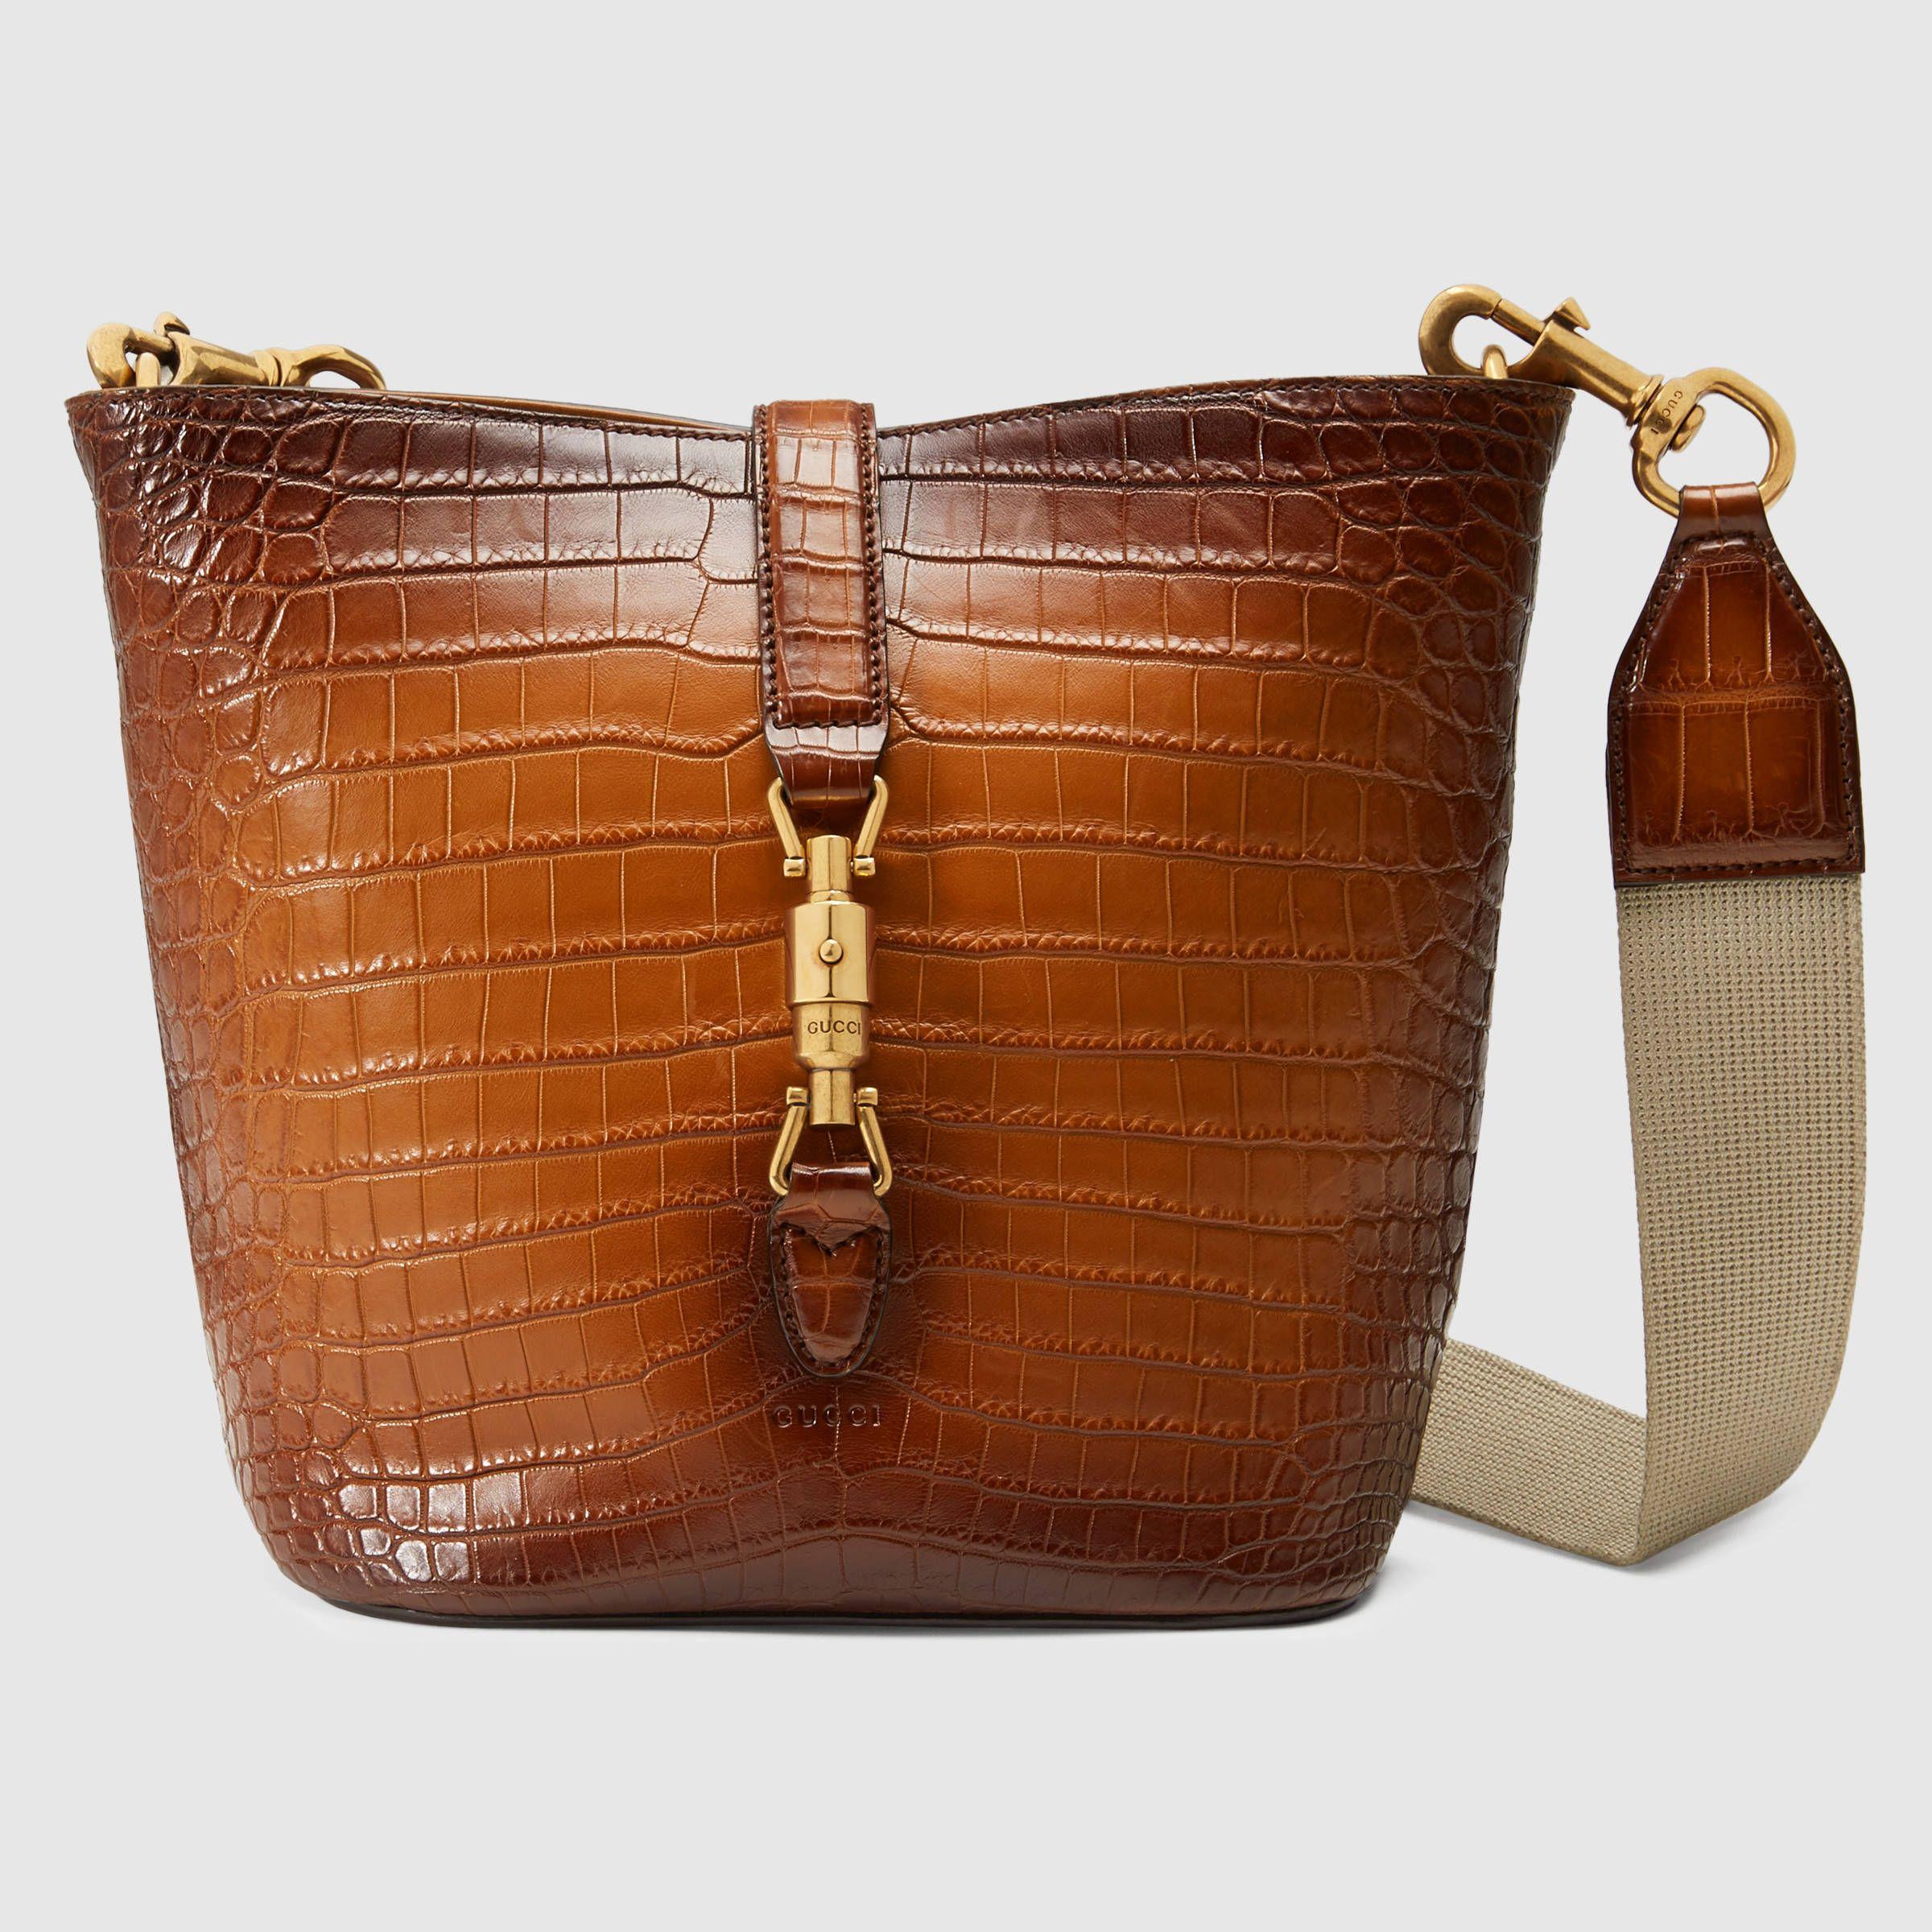 d88169bd4 Gucci Women - Jackie Soft crocodile bucket bag - 380579LI54A2565 ...